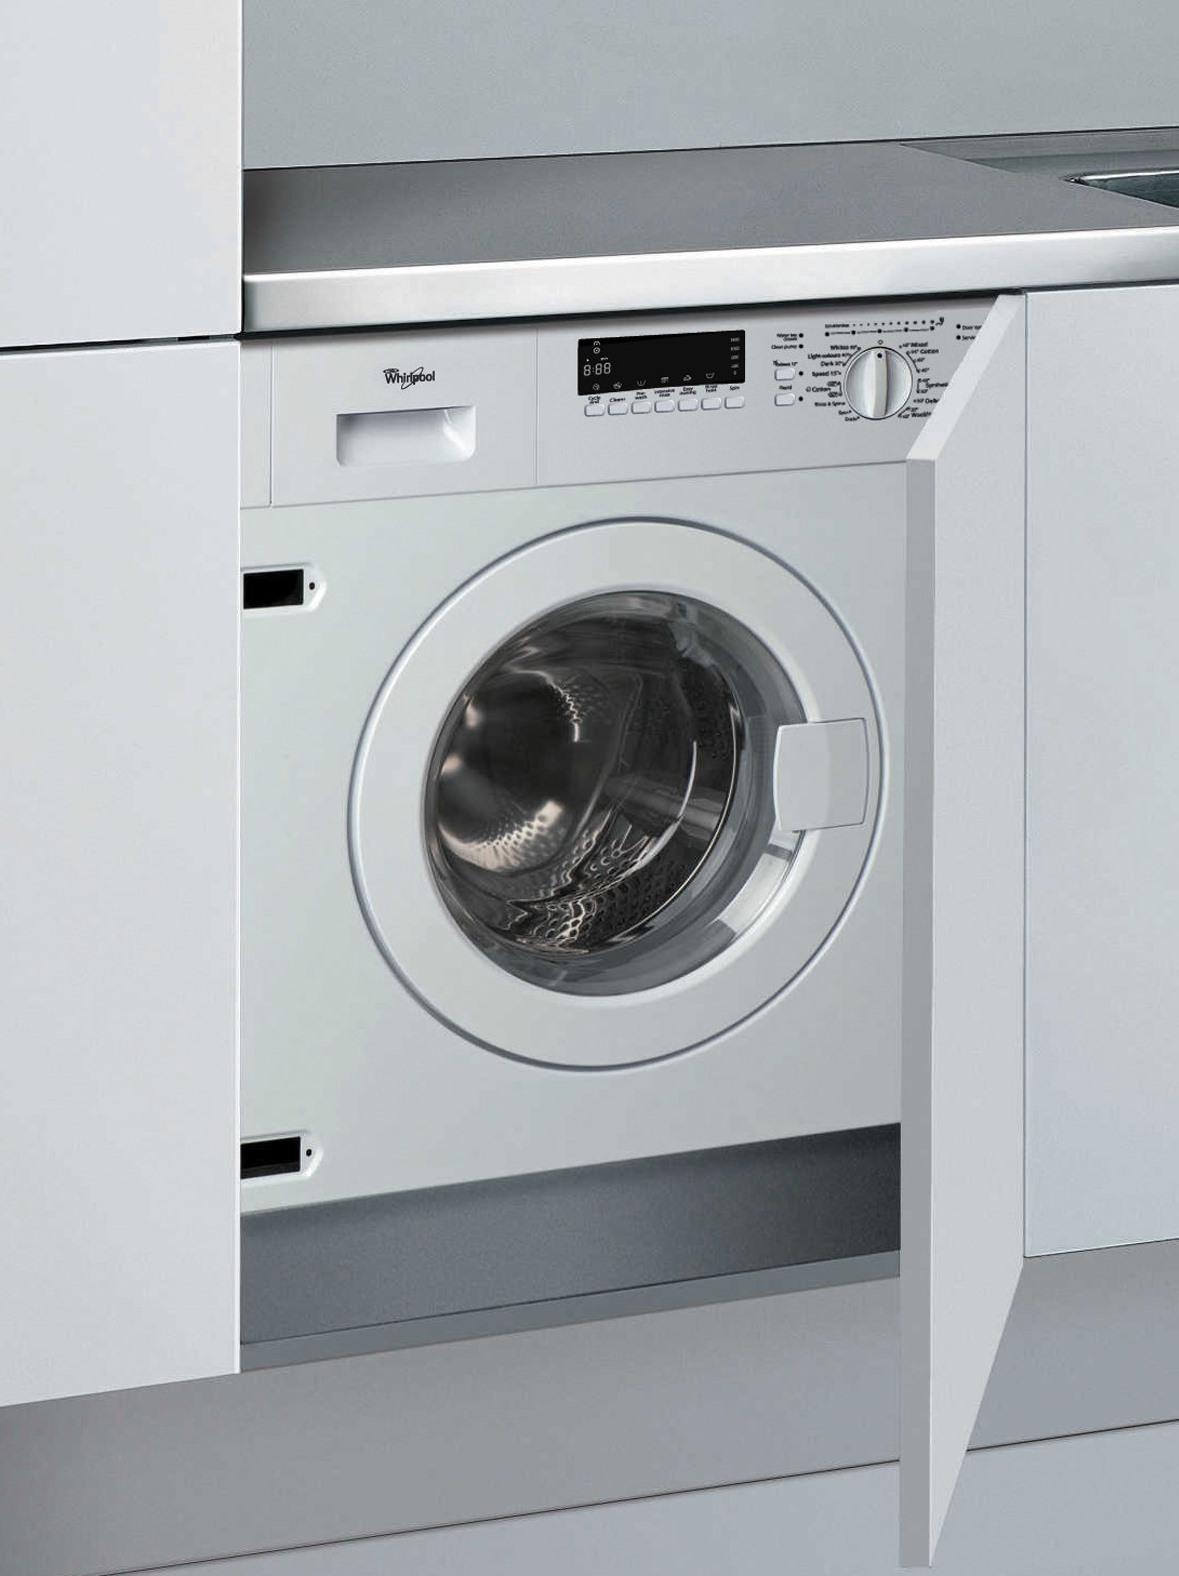 Встраиваемая стиральная машина Whirlpool AWOC 7714